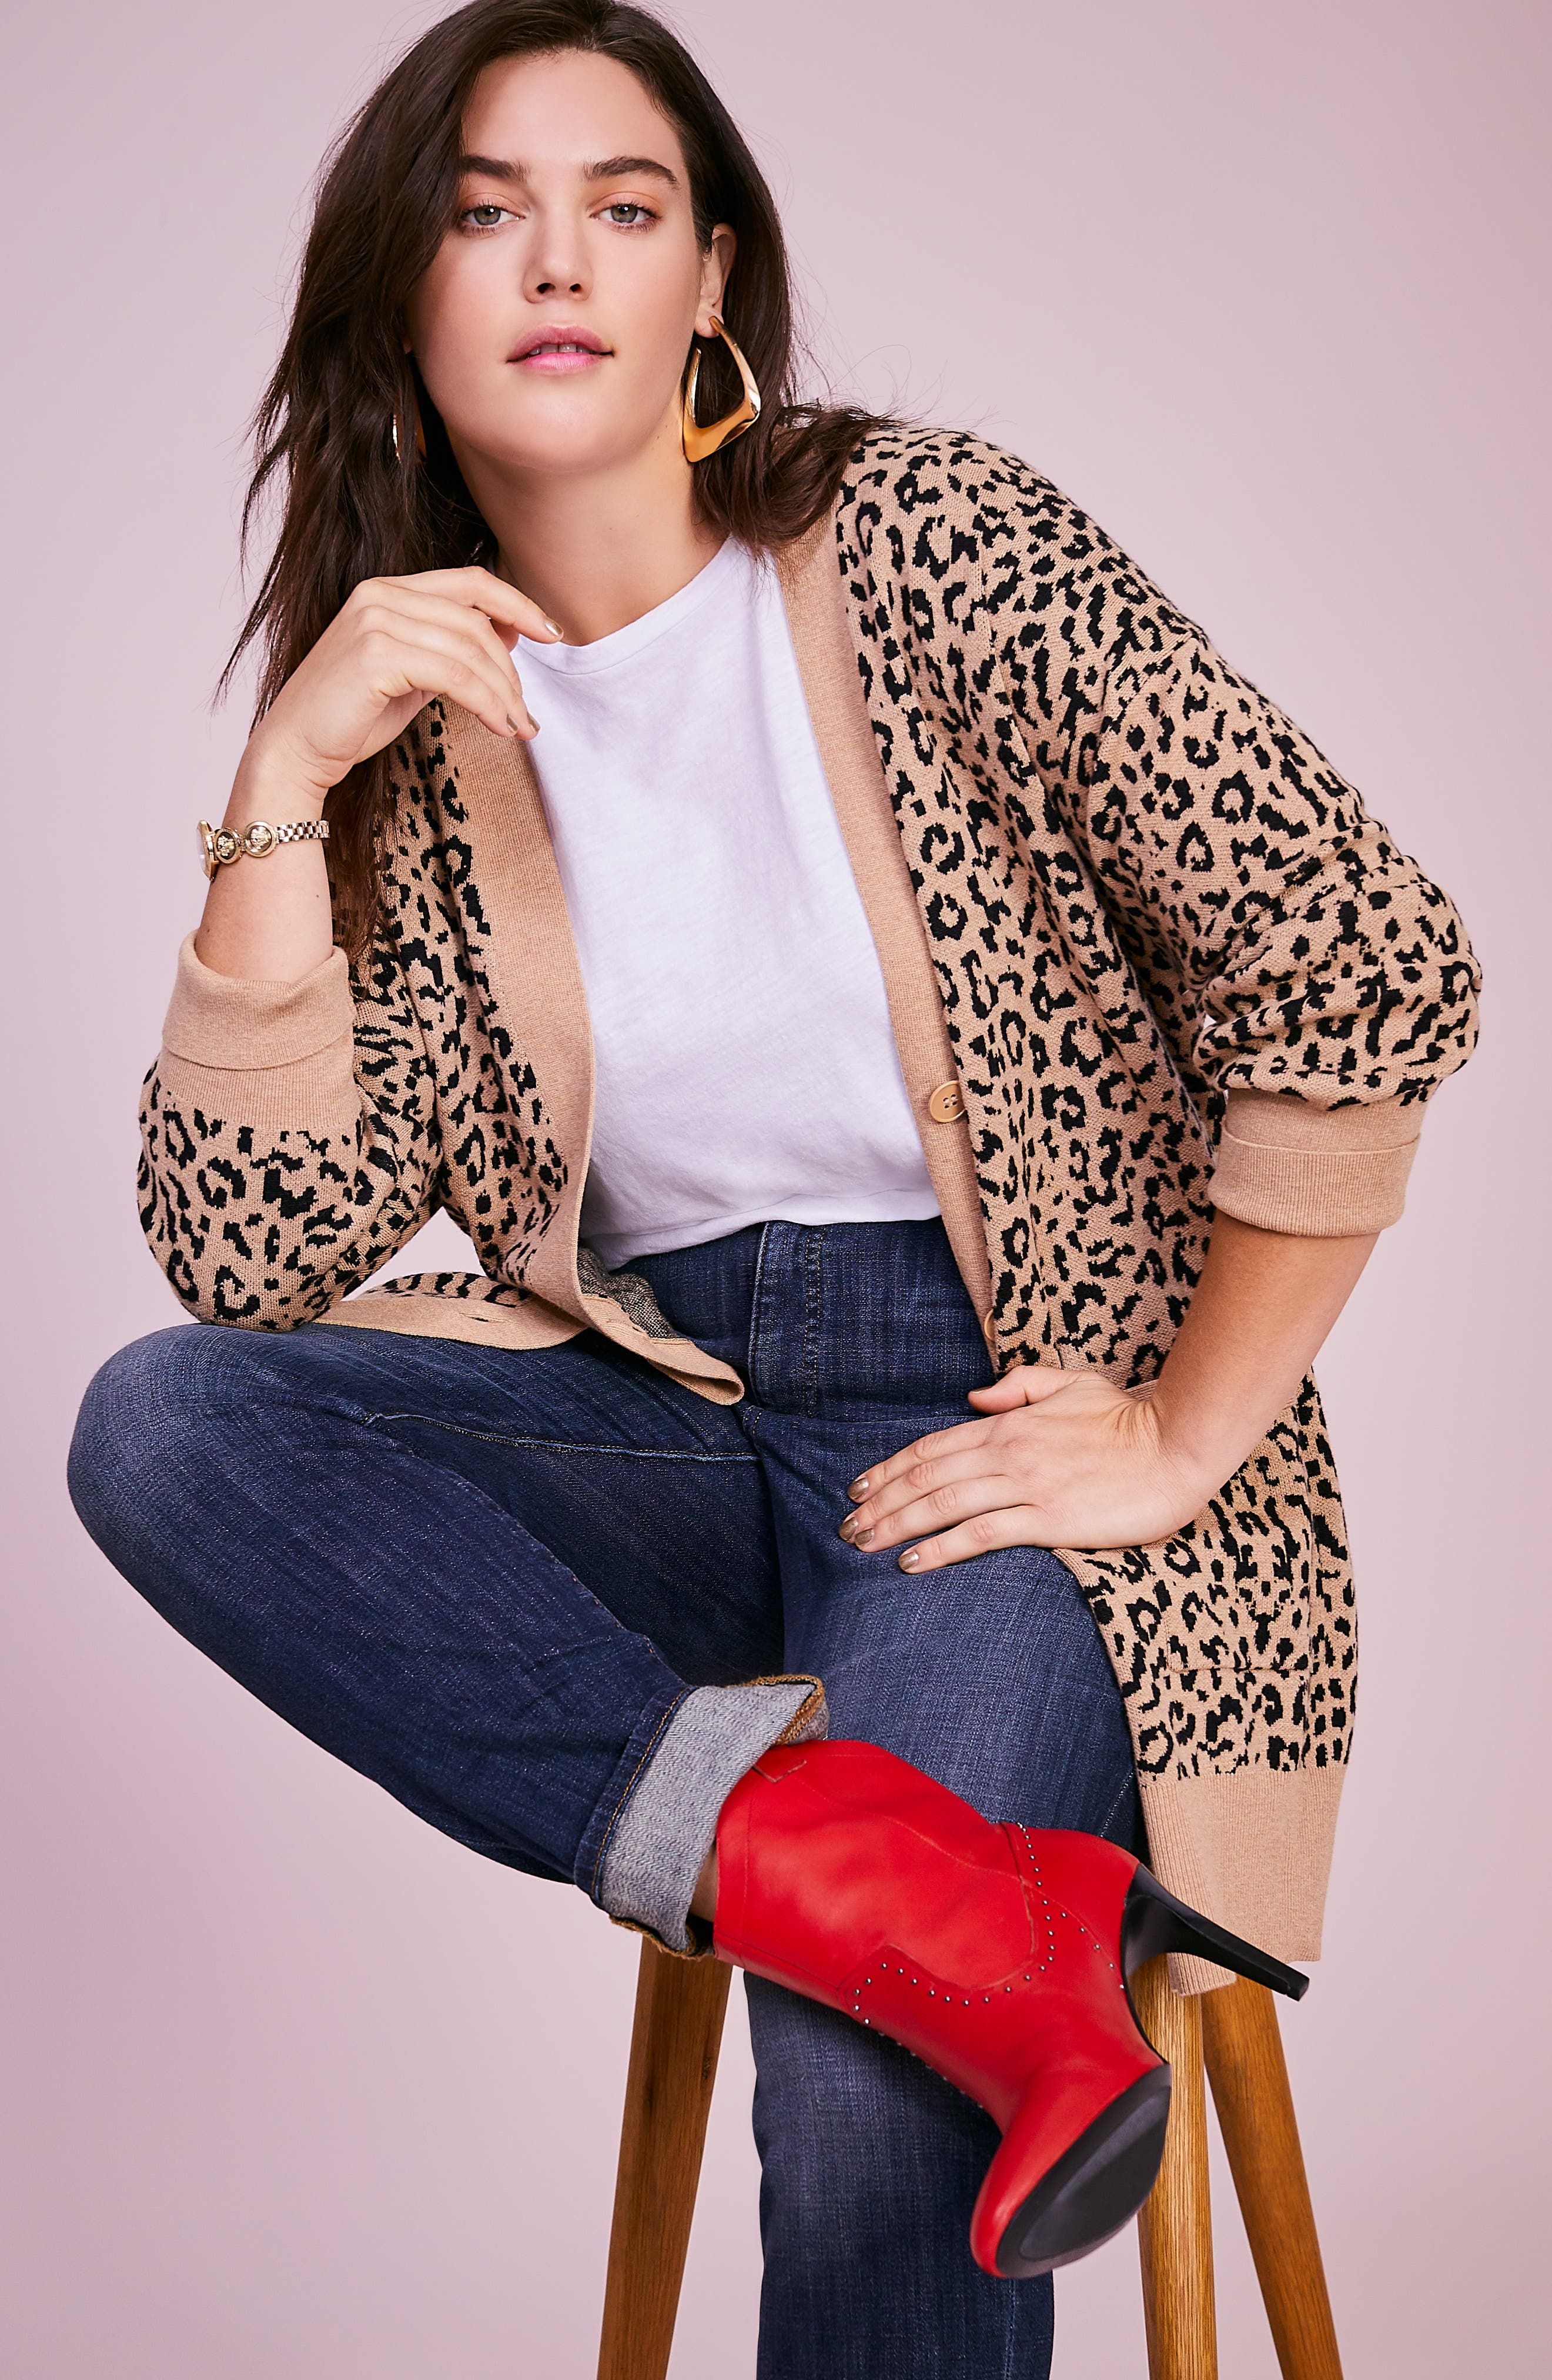 LUCKY BRAND, Emma High Rise Stretch Straight Leg Jeans, Alternate thumbnail 7, color, TIBURON